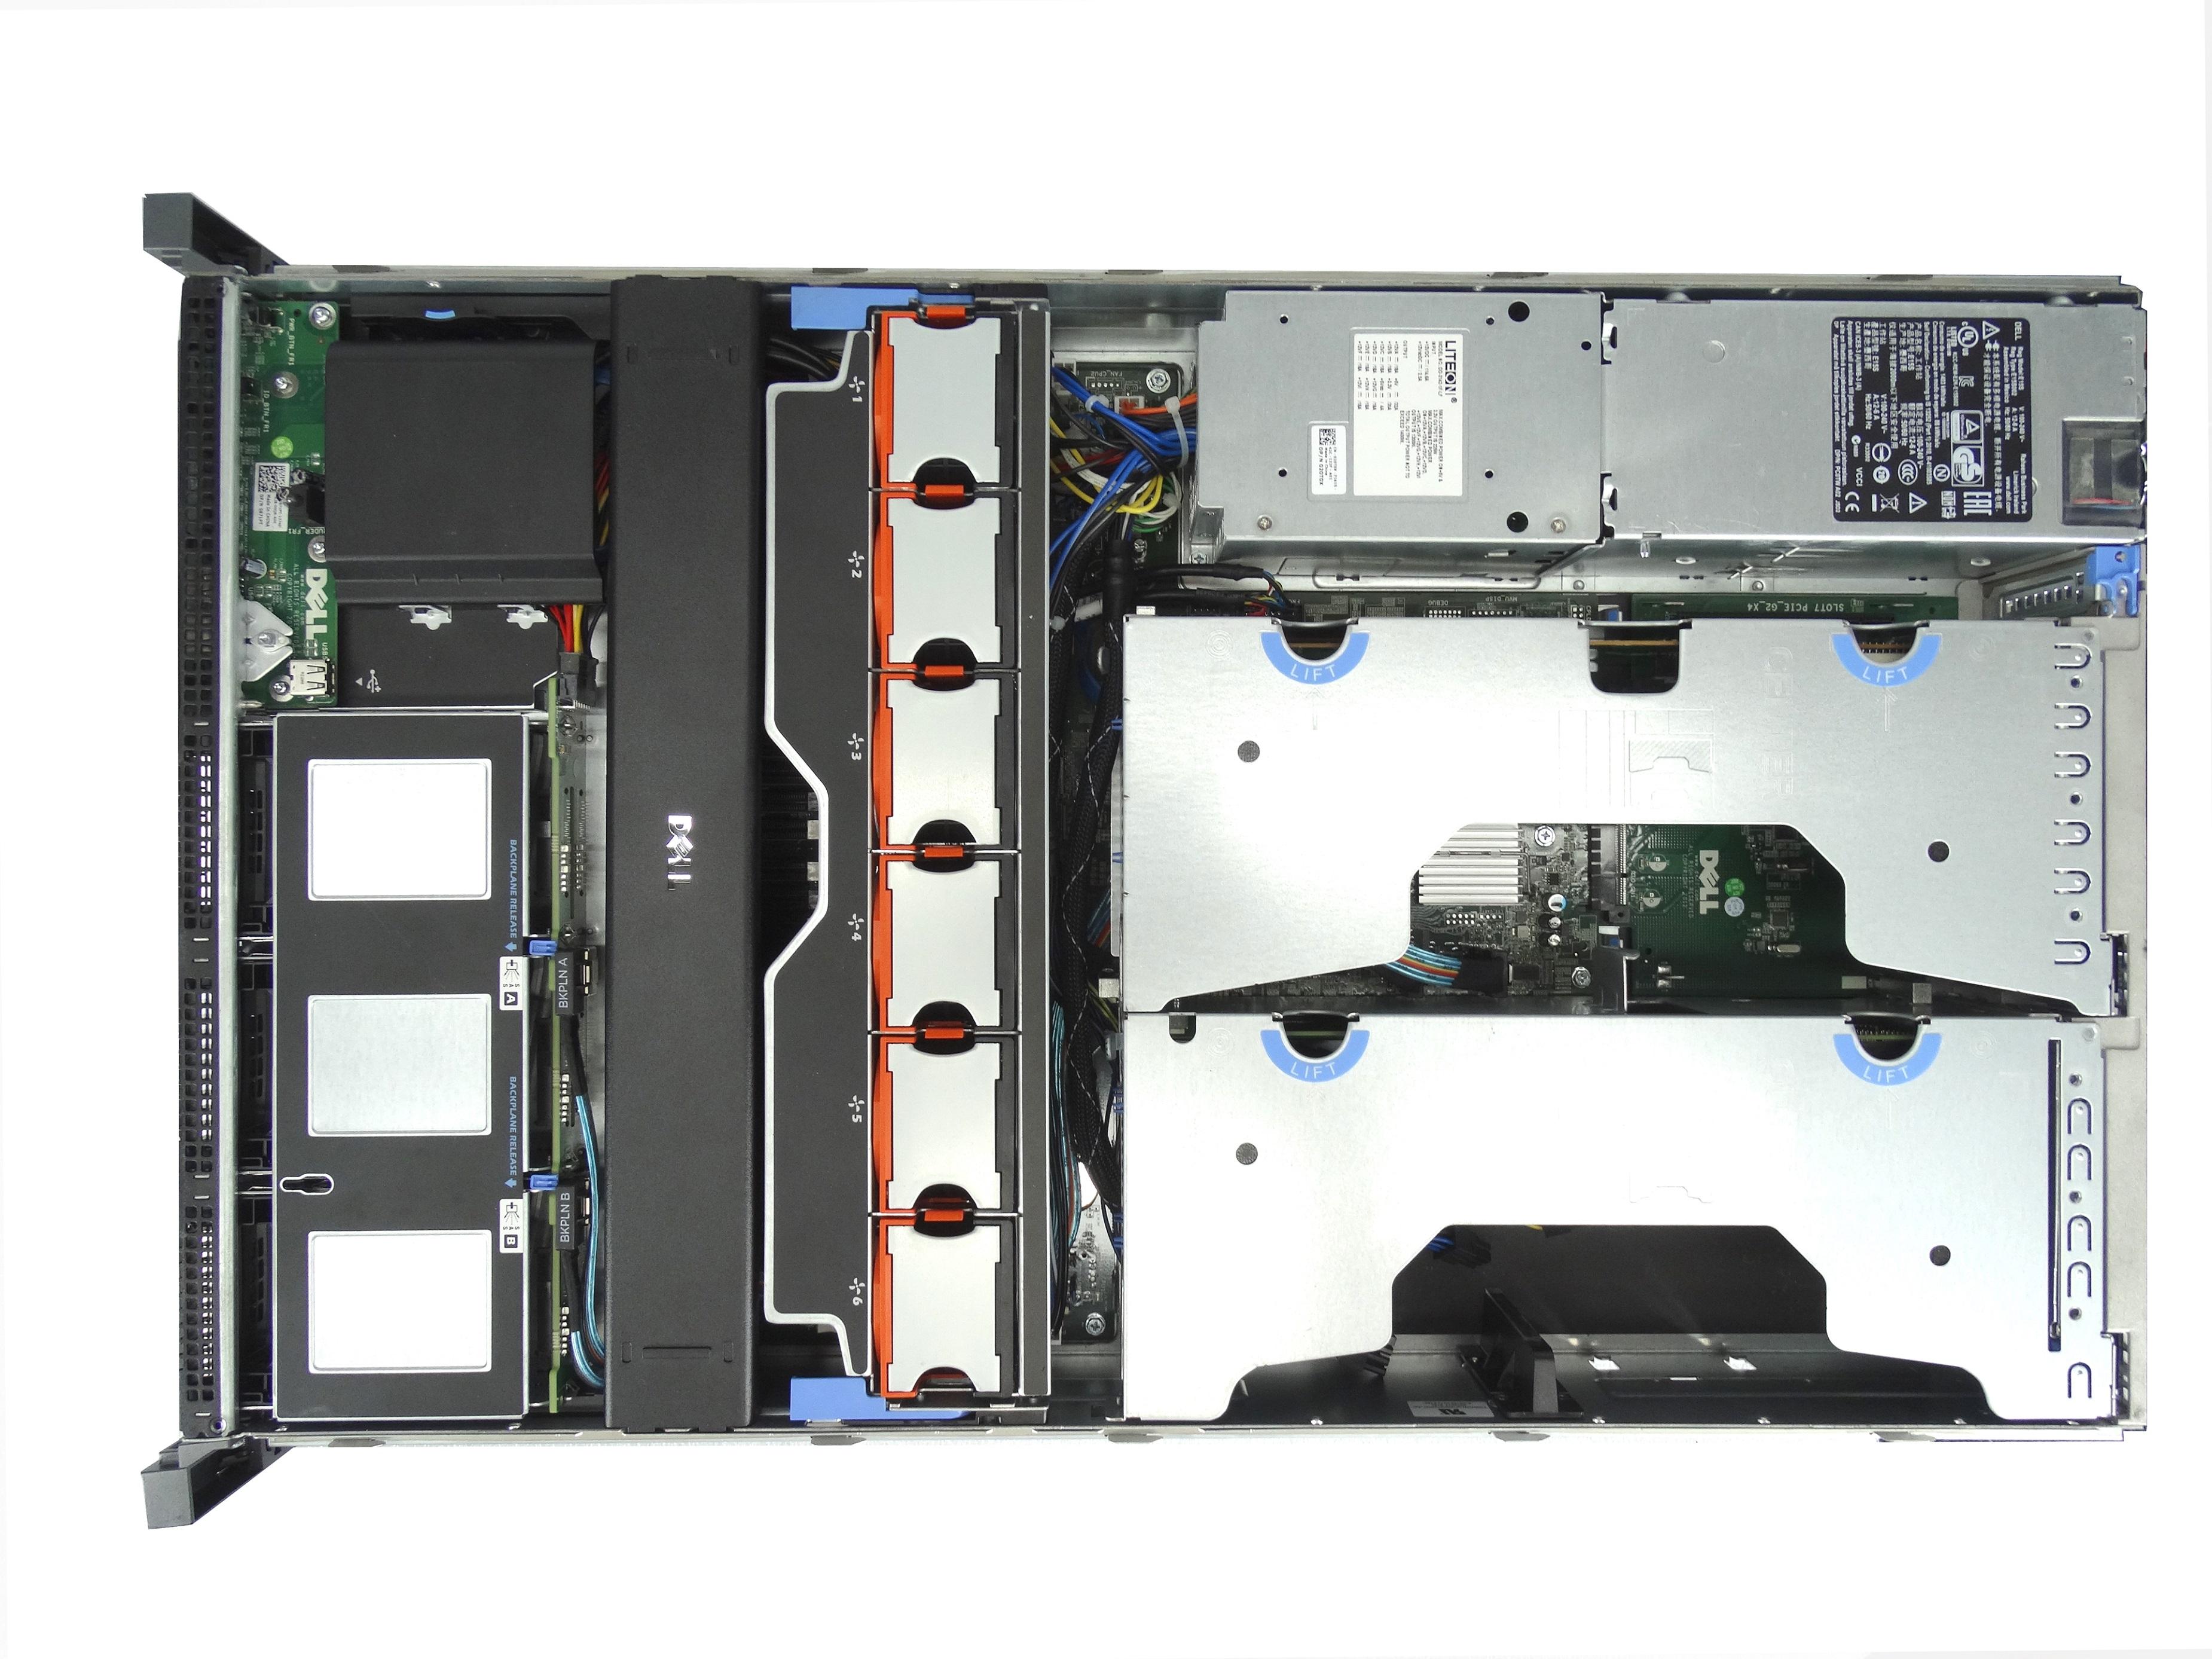 Dell Precision R7610 Rackmount Workstation